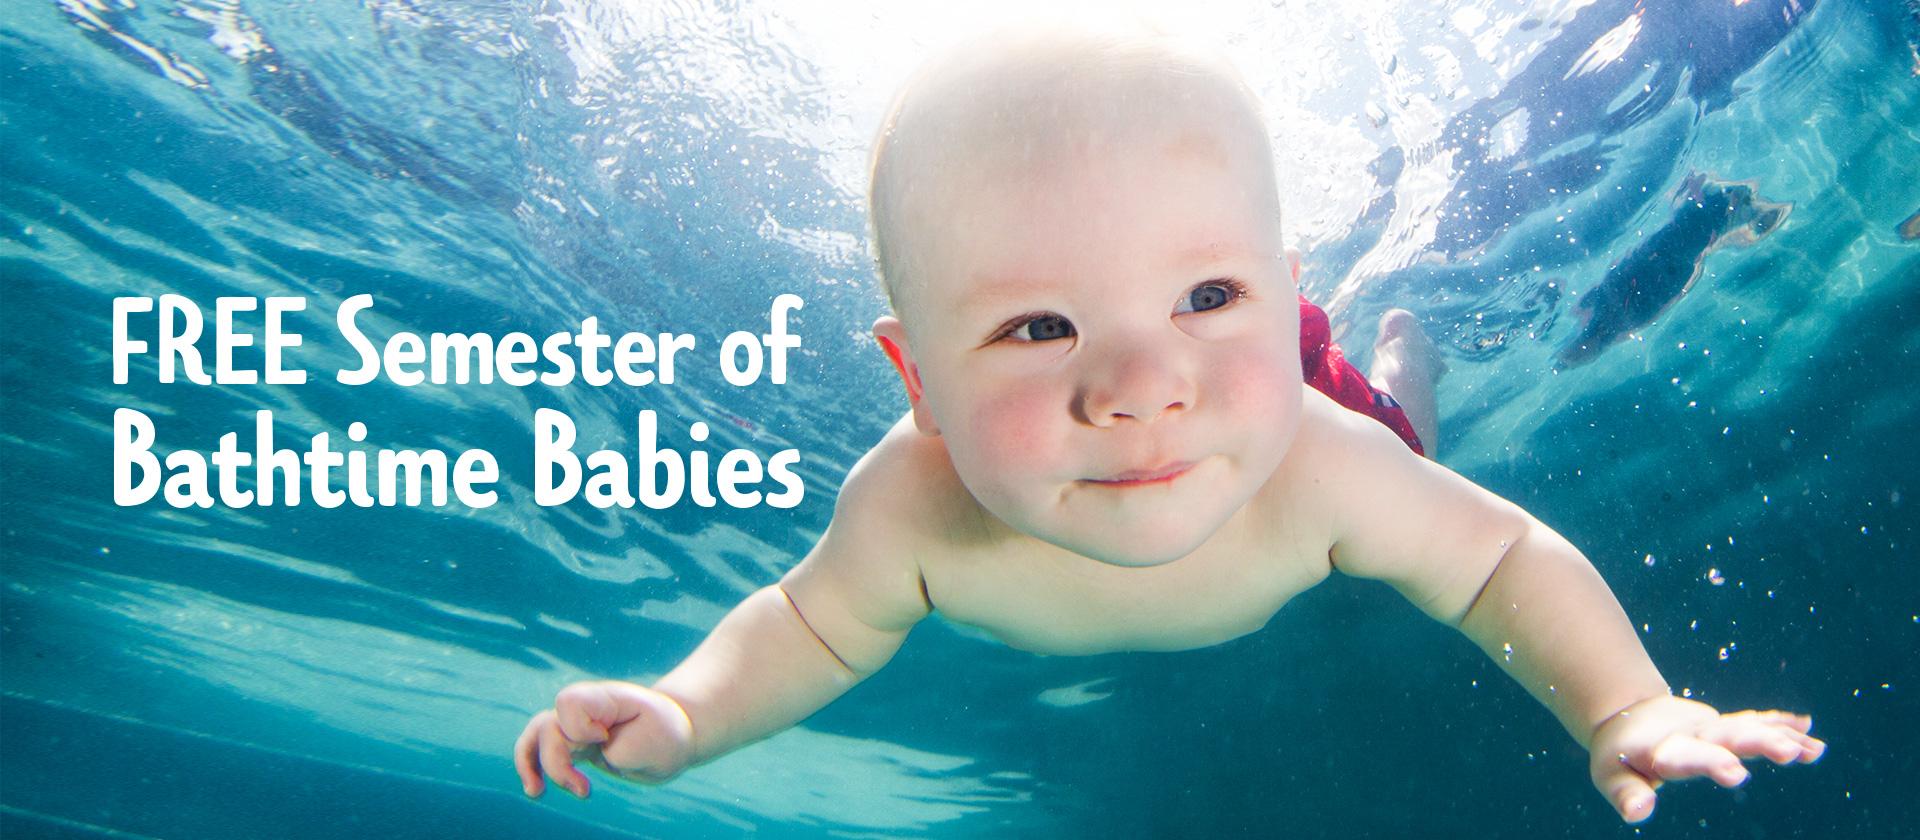 Free Semester of Bathtime Babies